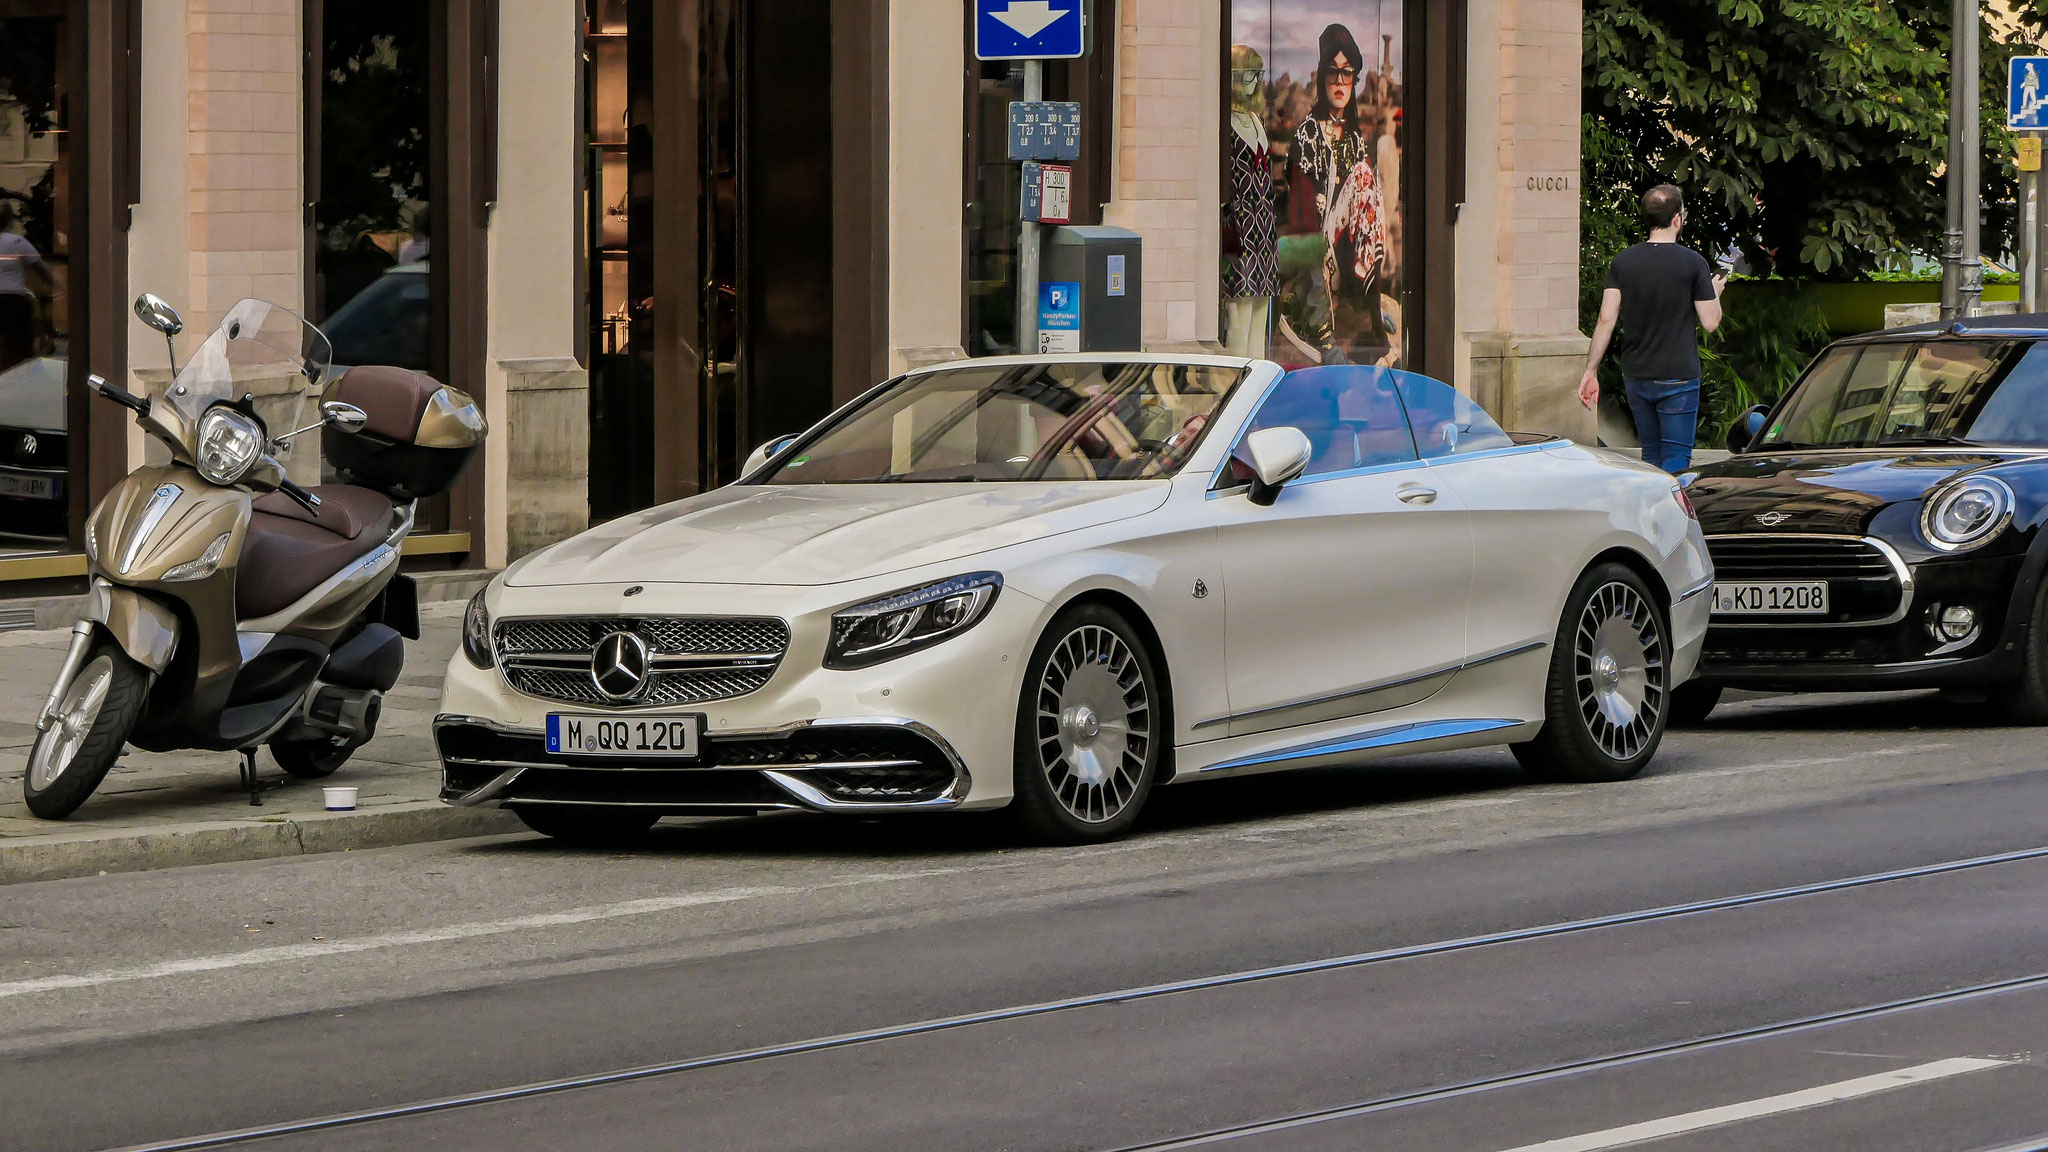 Mercedes-Maybach S 650 Cabrio (1of300) - M-QQ-120